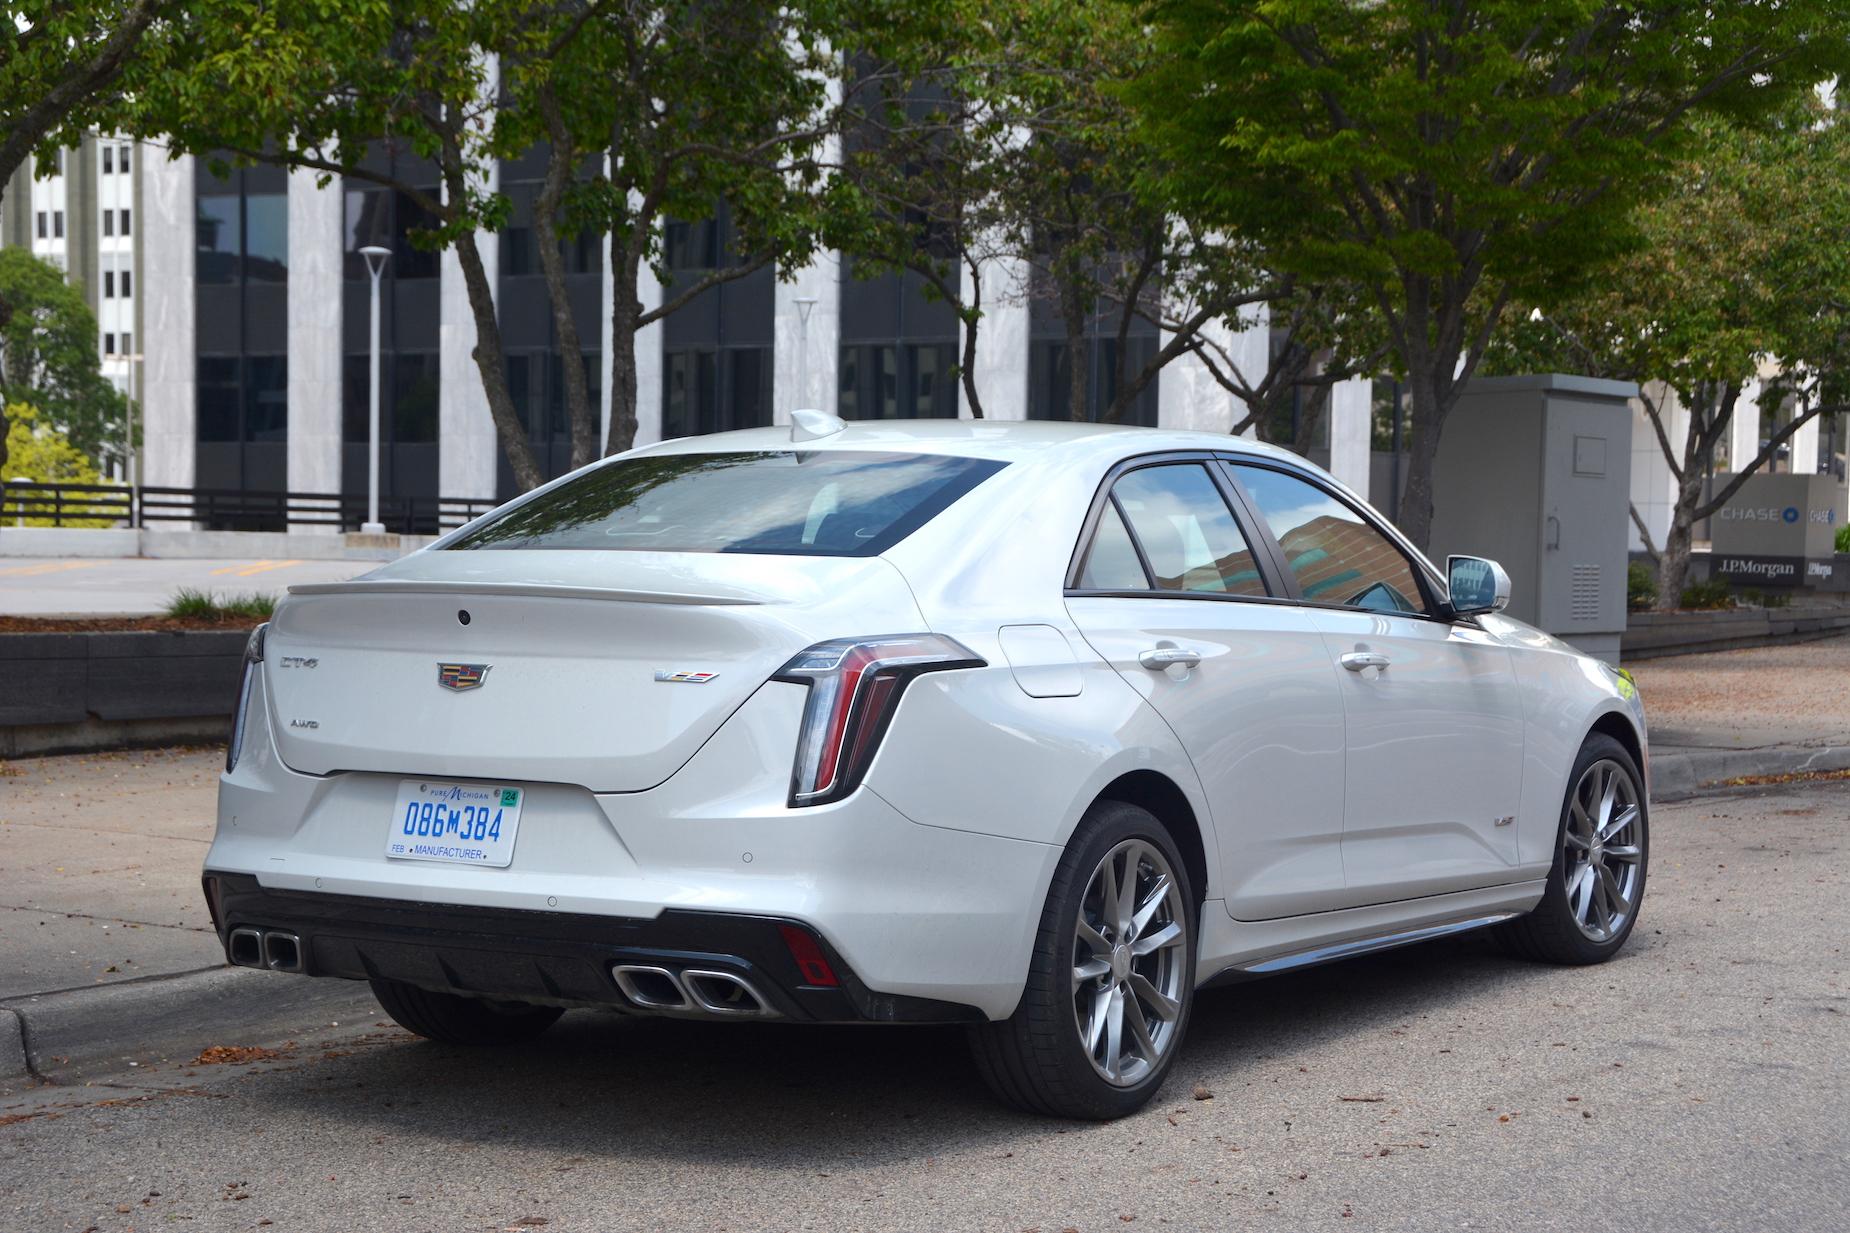 2021 Cadillac CT4-V specs